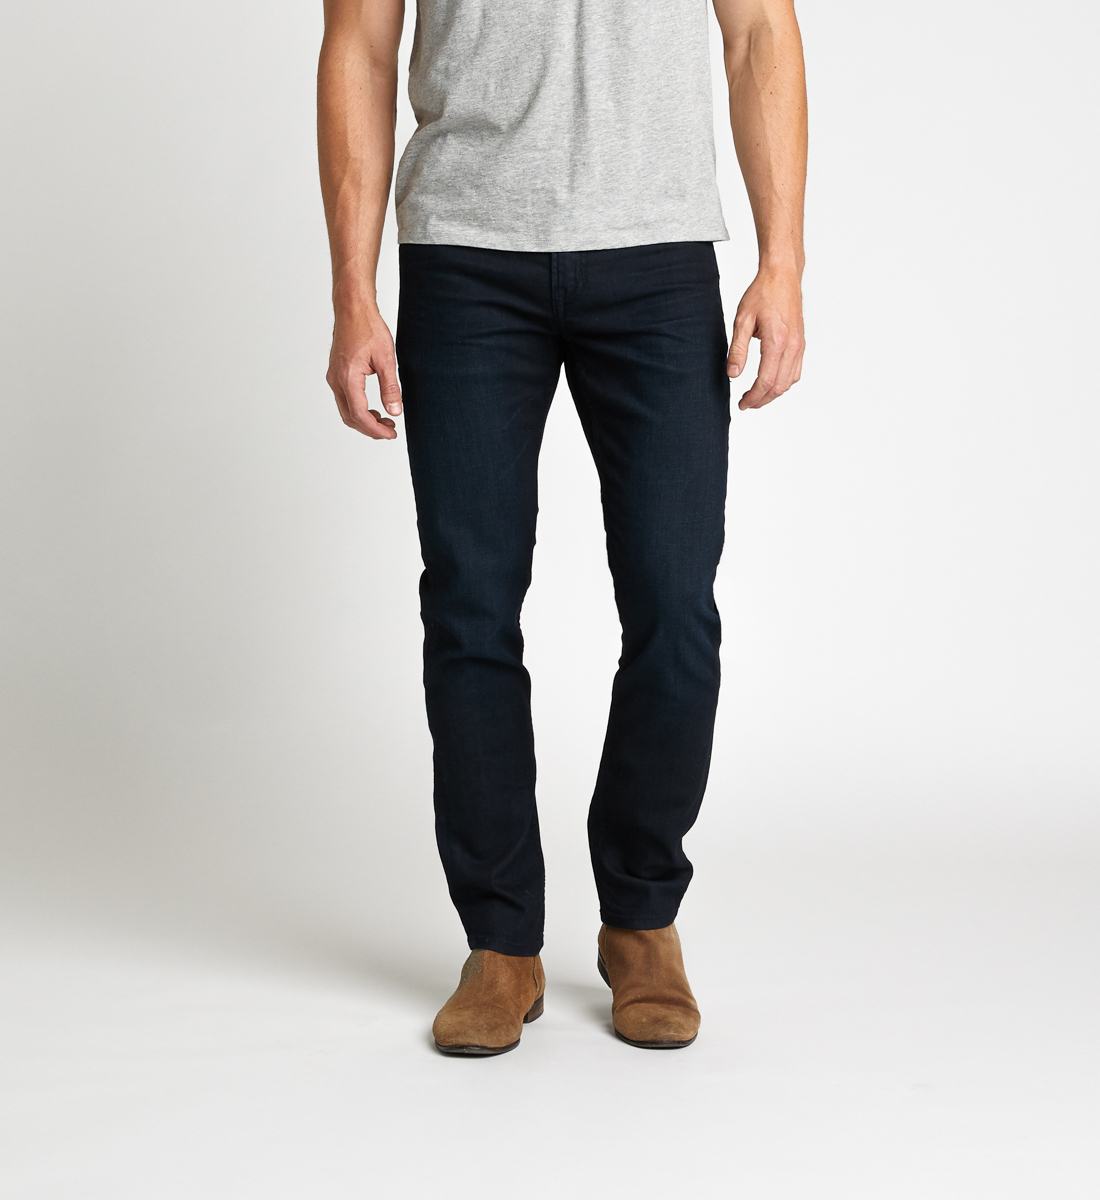 Silver Jeans Taavi Slim Fit Skinny Jeans